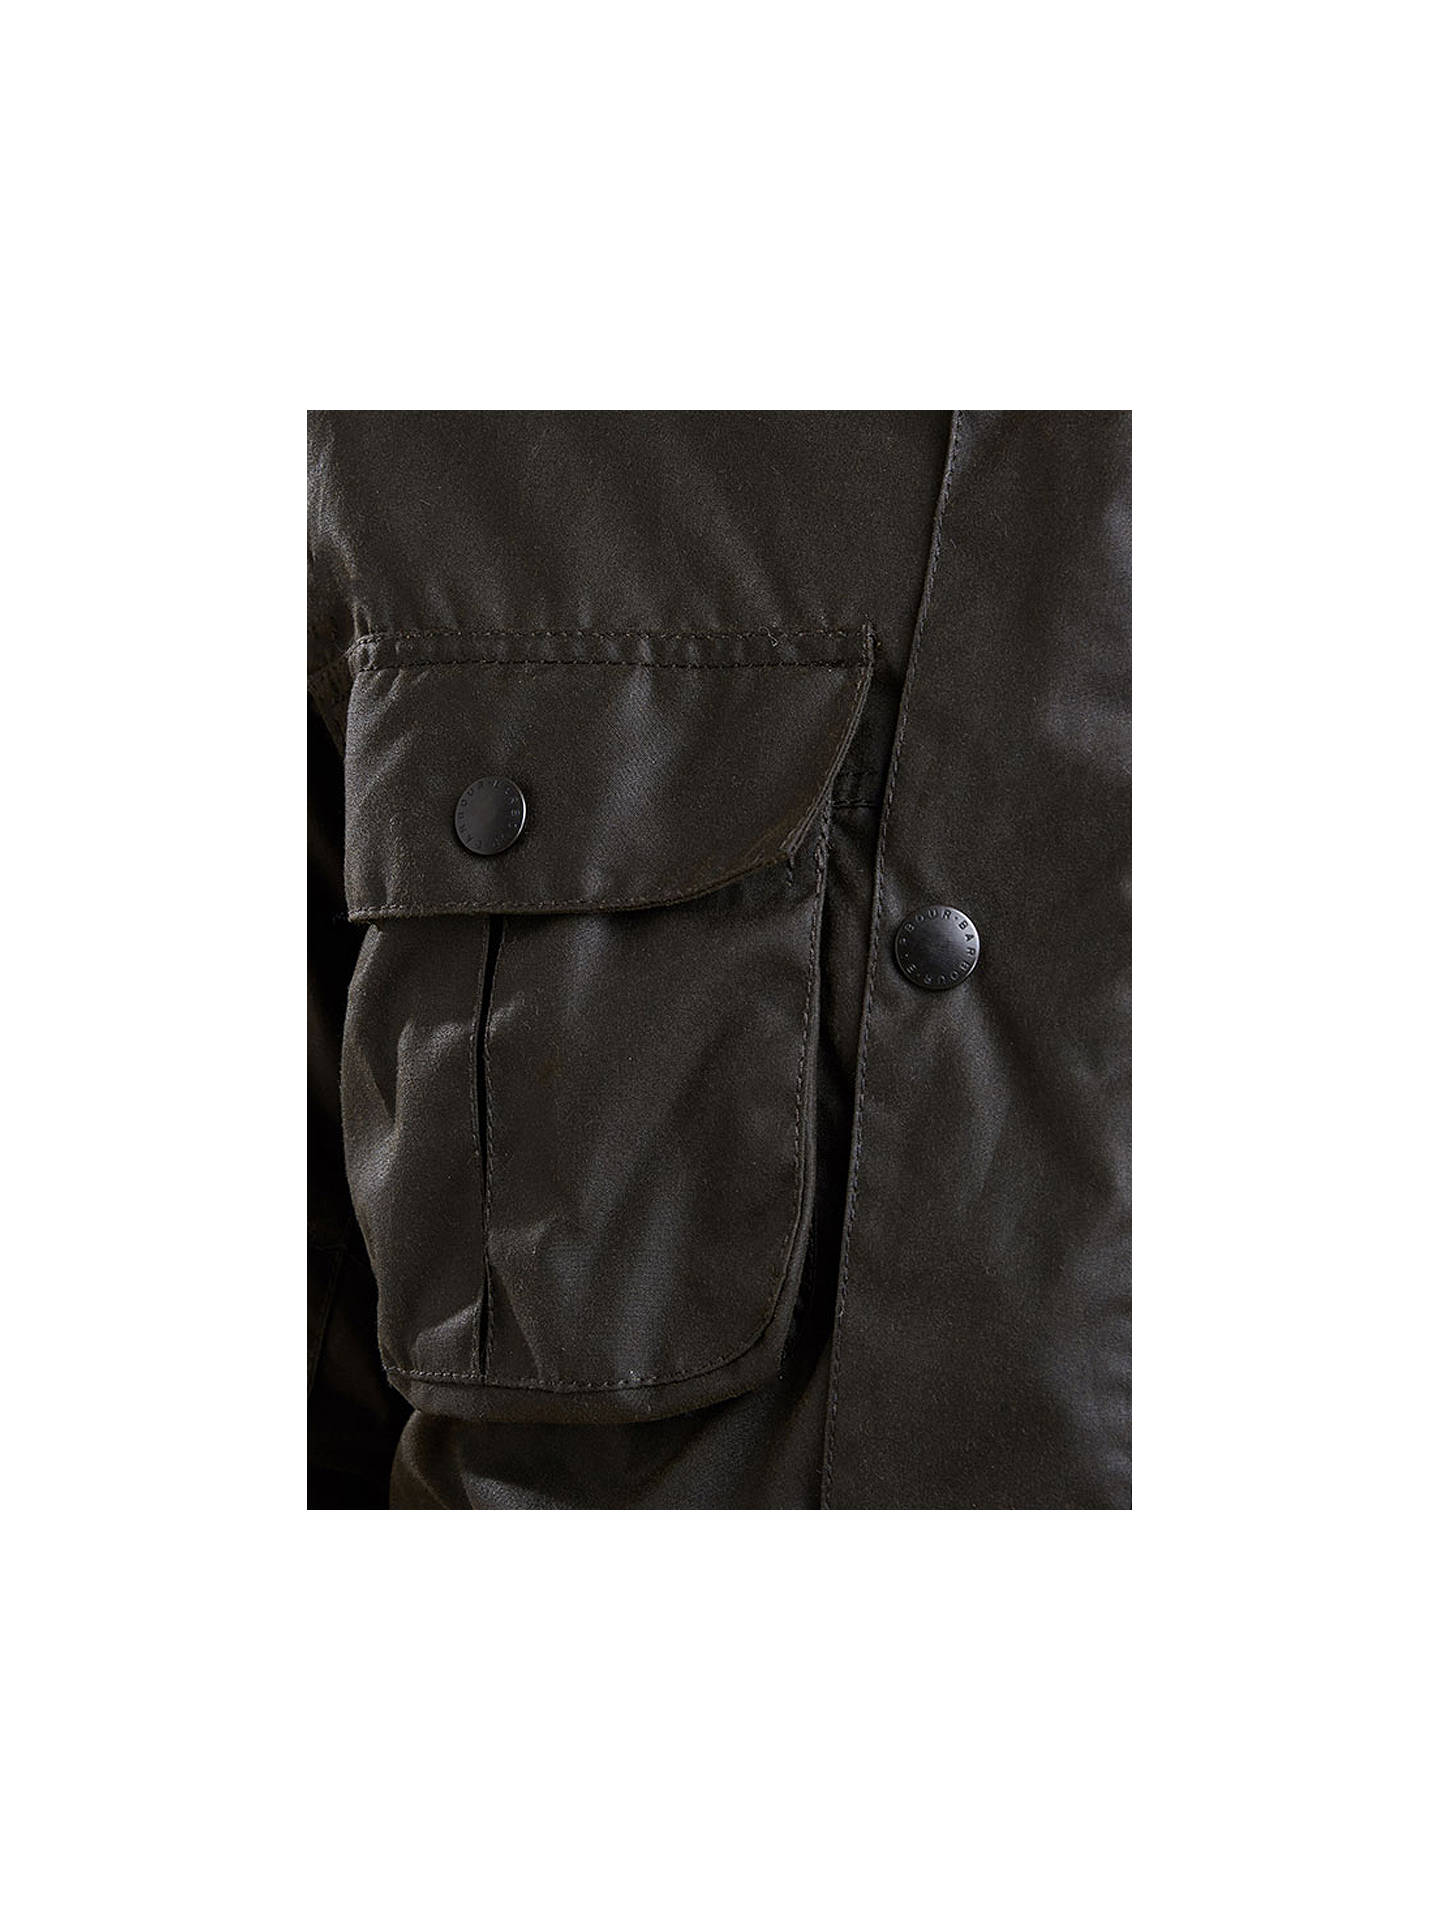 5a5499b618044 ... Buy Barbour Trooper Wax Jacket, Olive, S Online at johnlewis.com ...